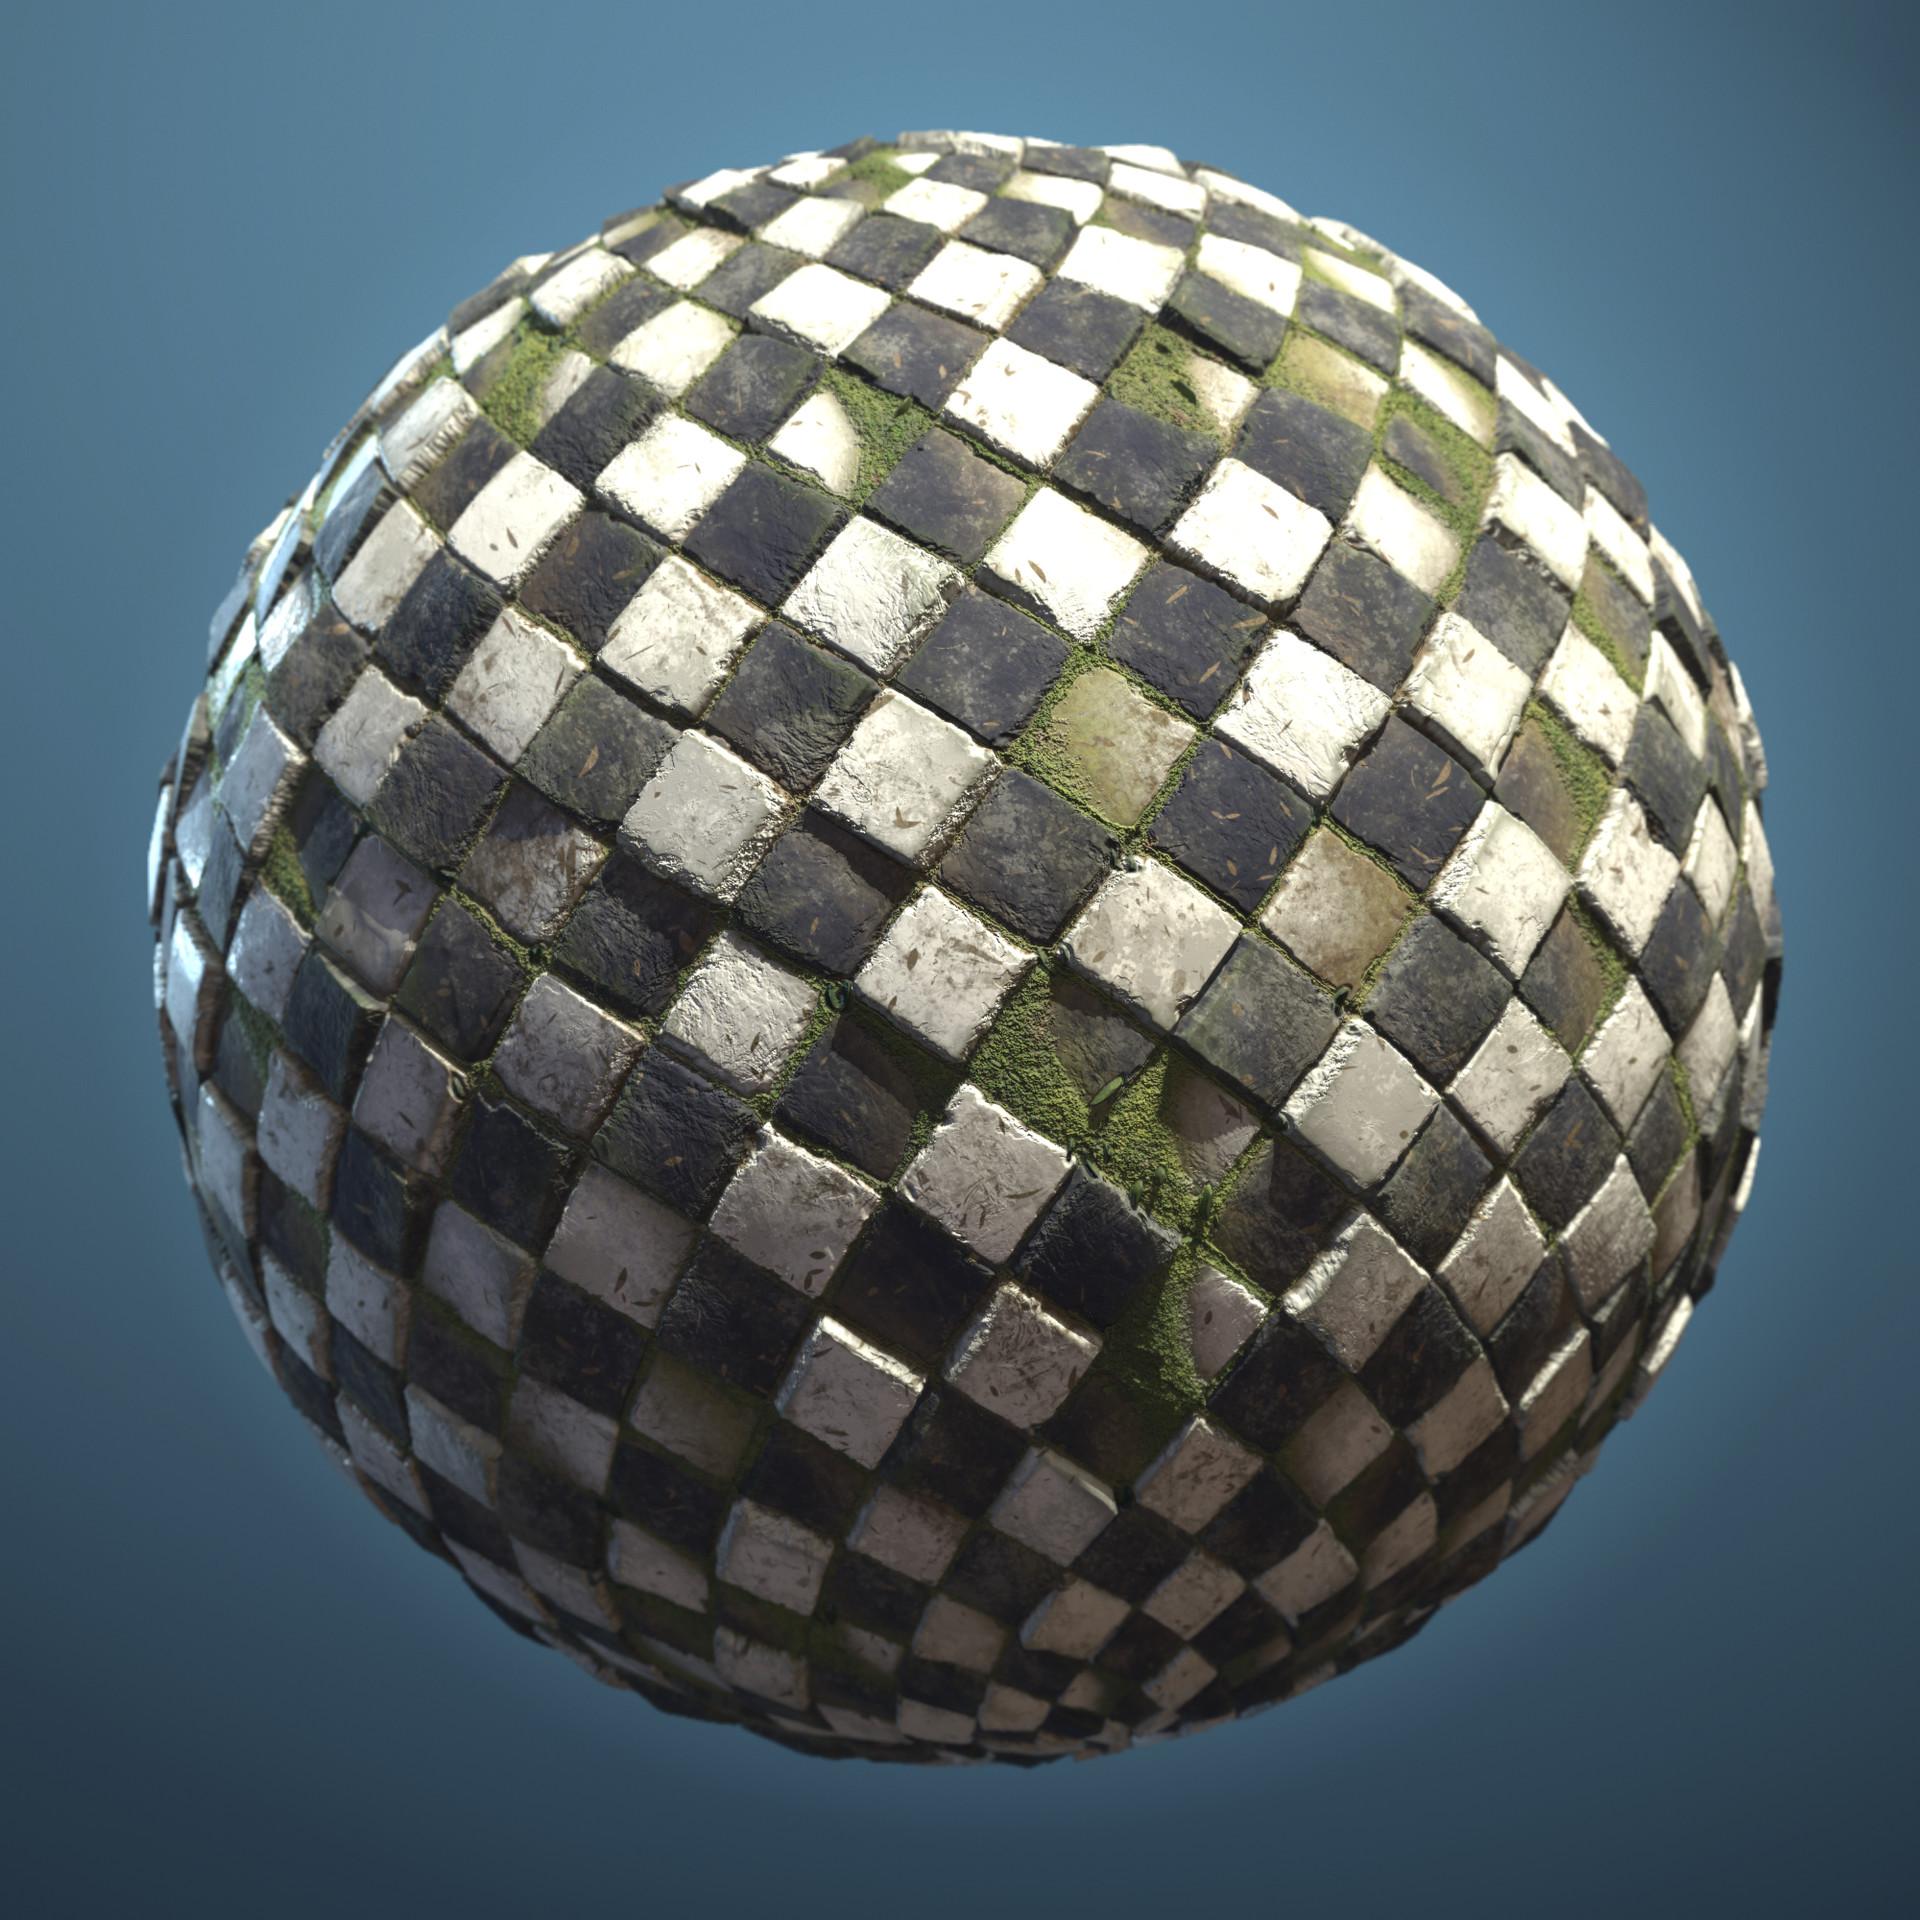 Mossy checkerboard floor